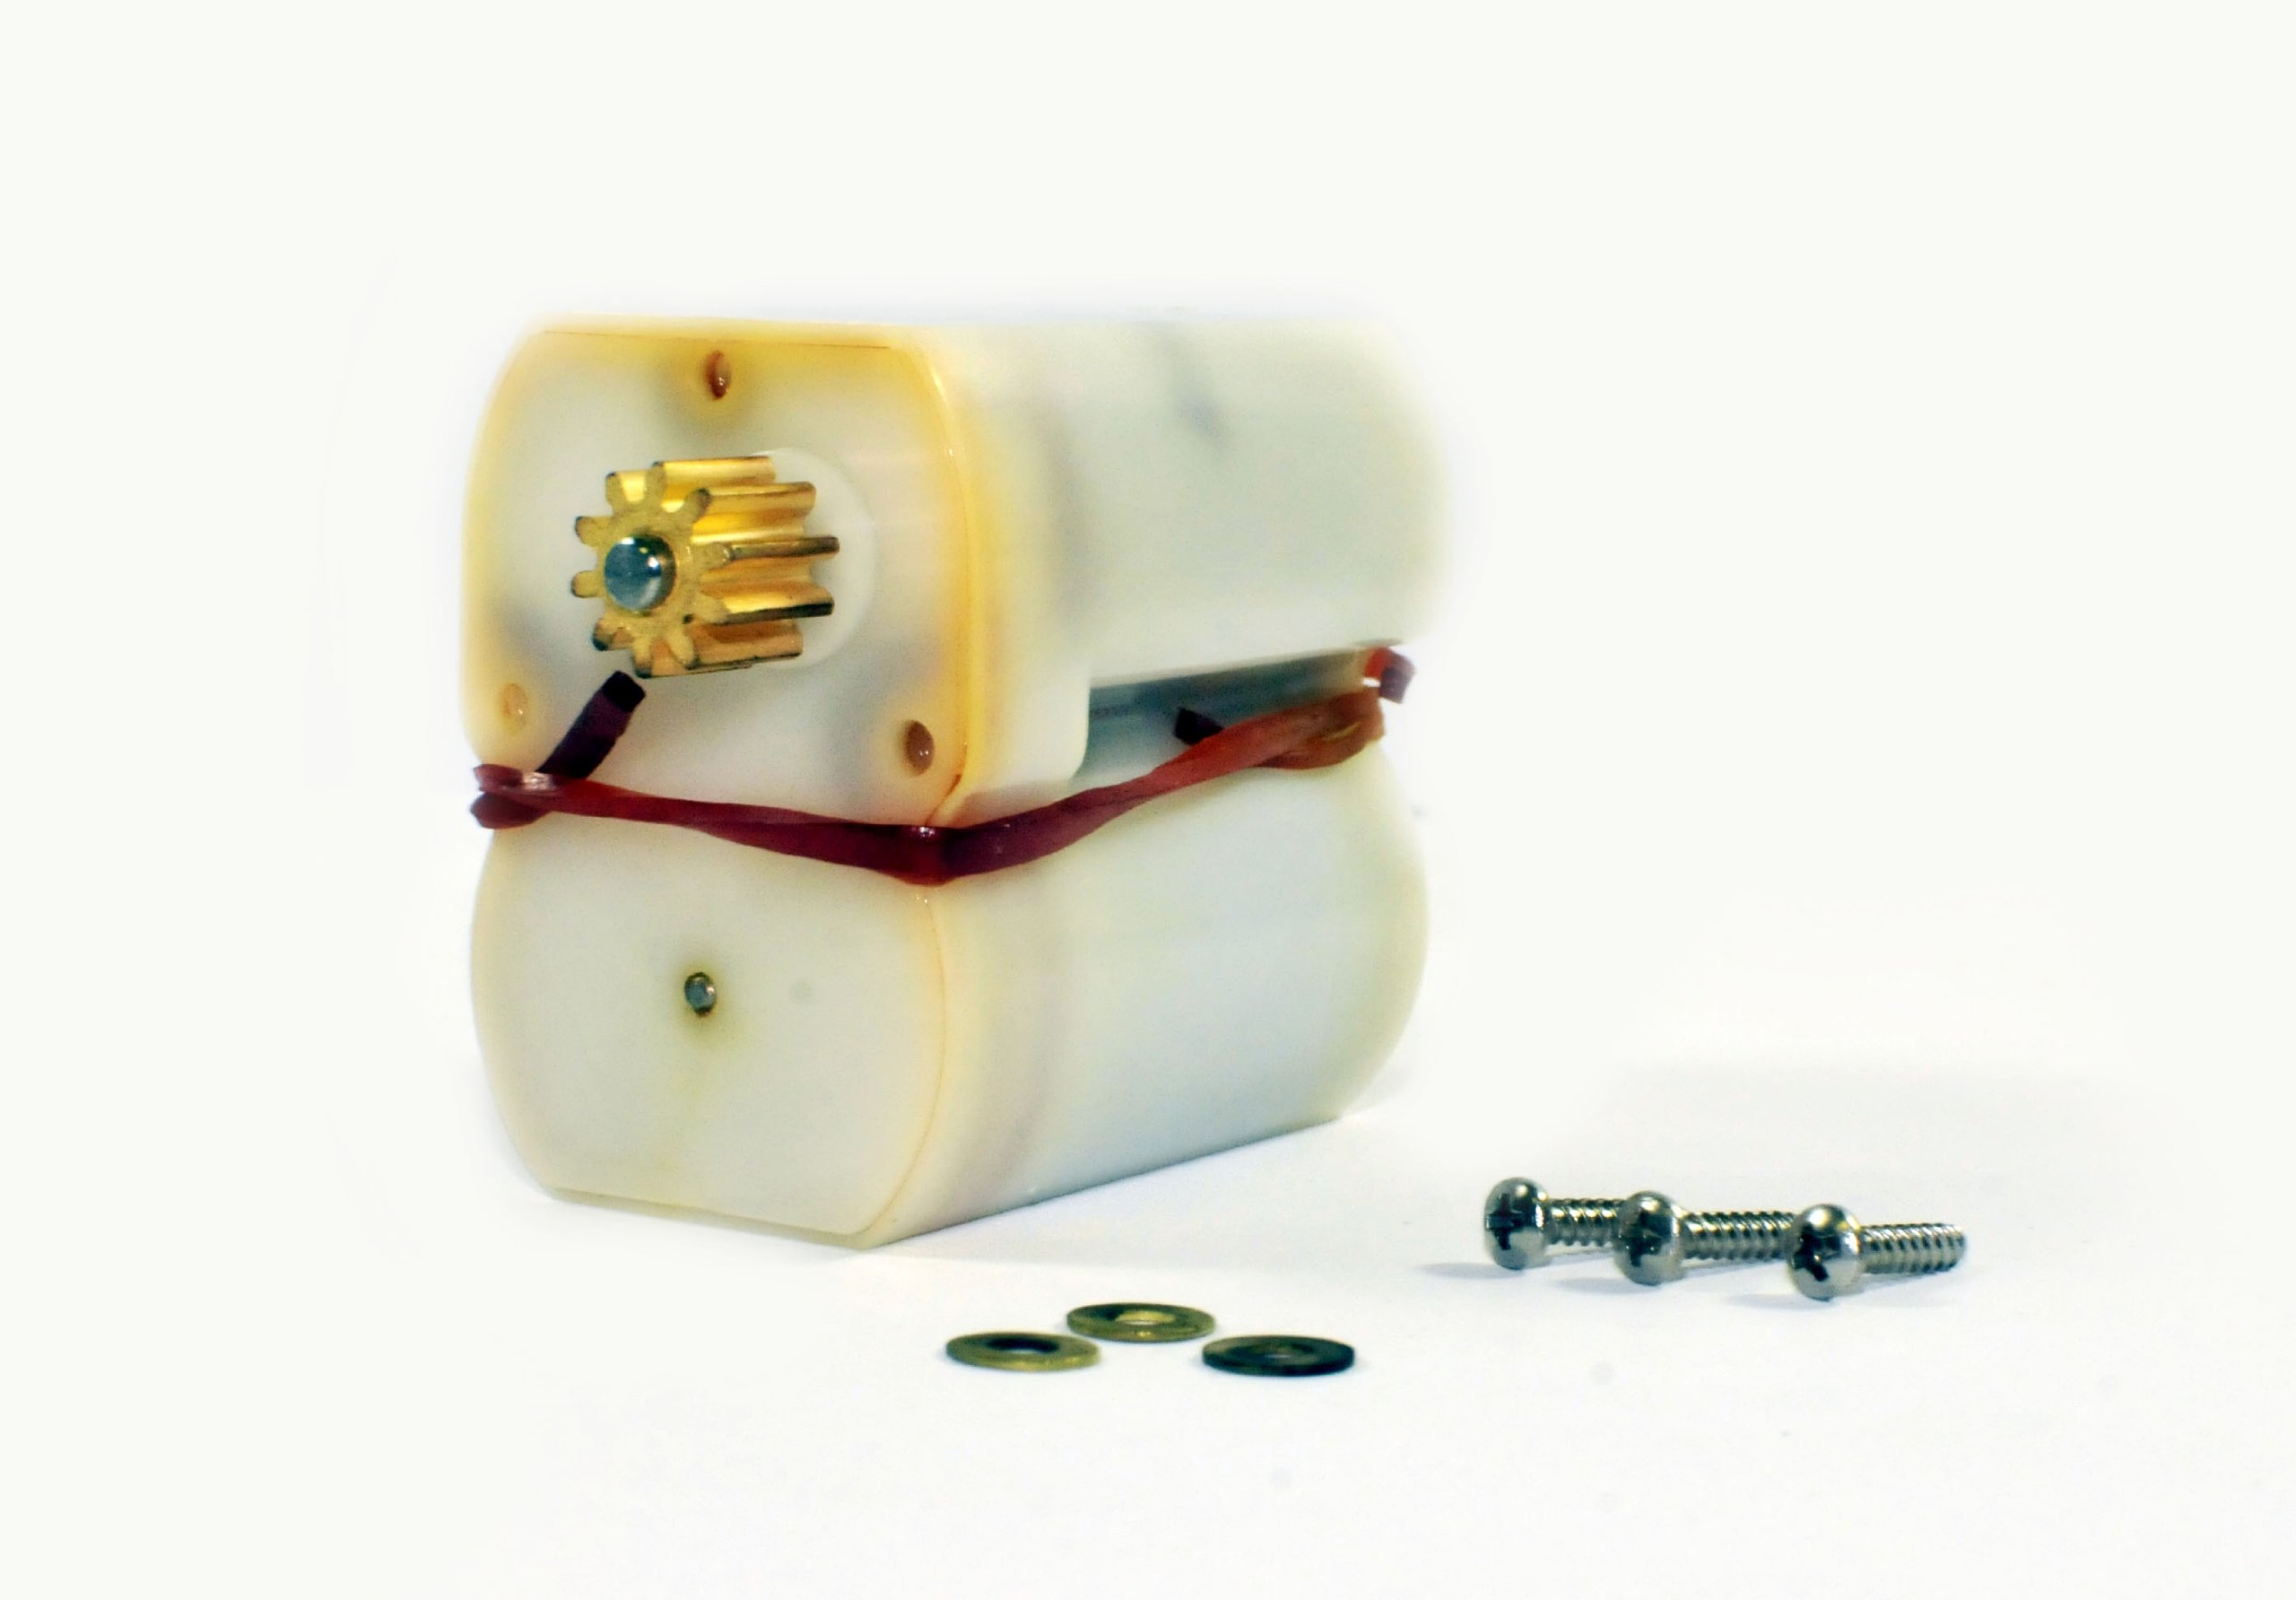 Jabsco Motor Kit, Horizontal, fits 60010/60020 Searchlights 18753-0350, Motor Kit, Horizontal, fits 60010/60020 Searchlights by Jabsco